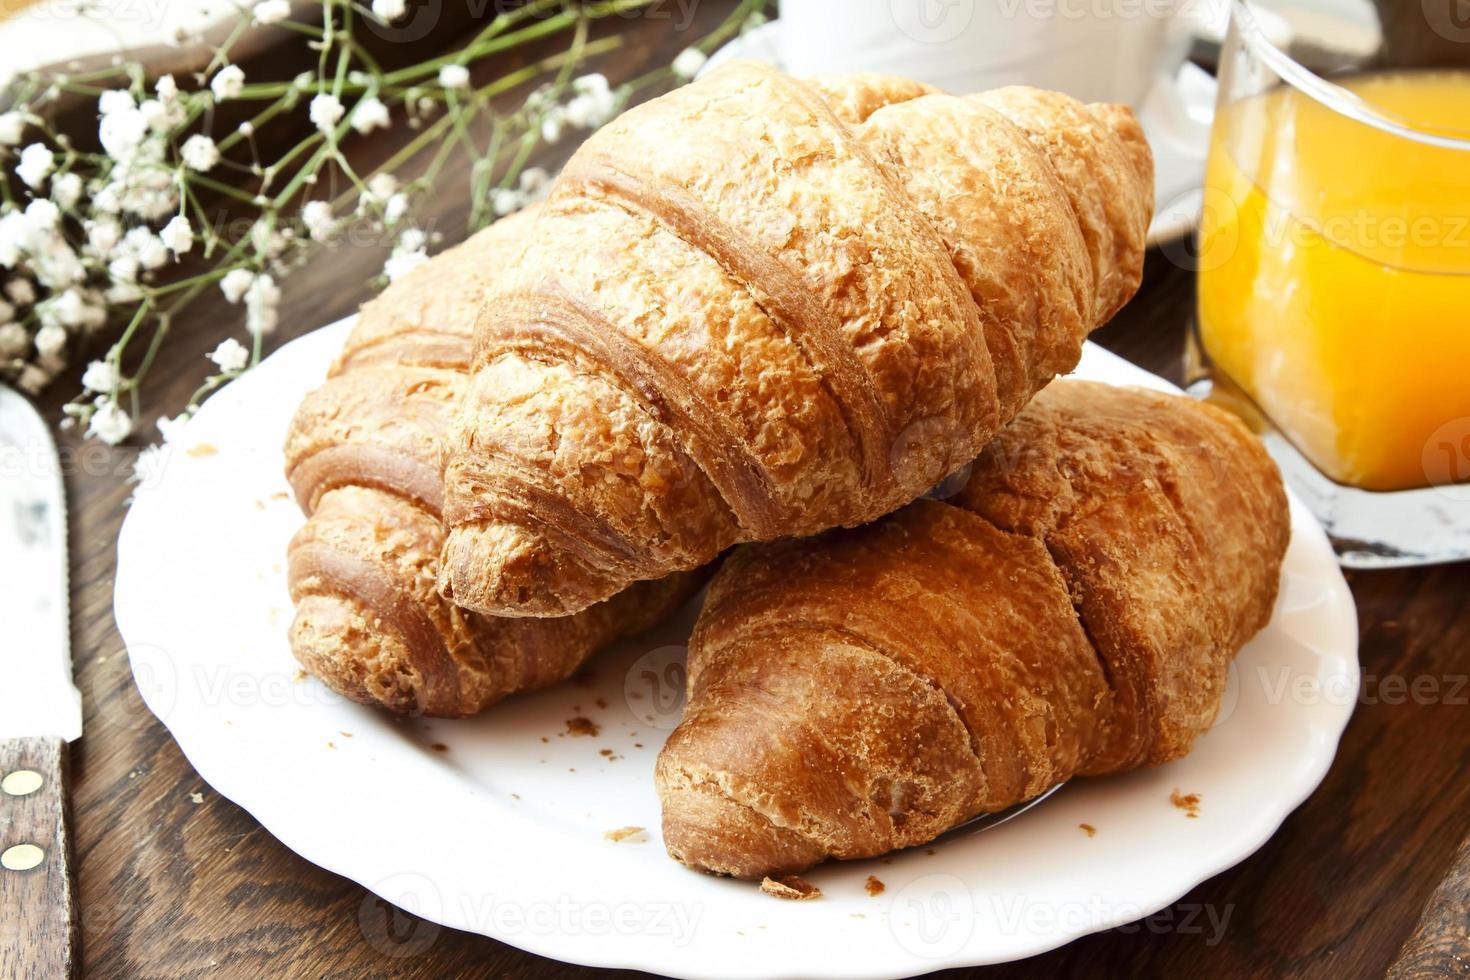 croissants franceses no café da manhã foto